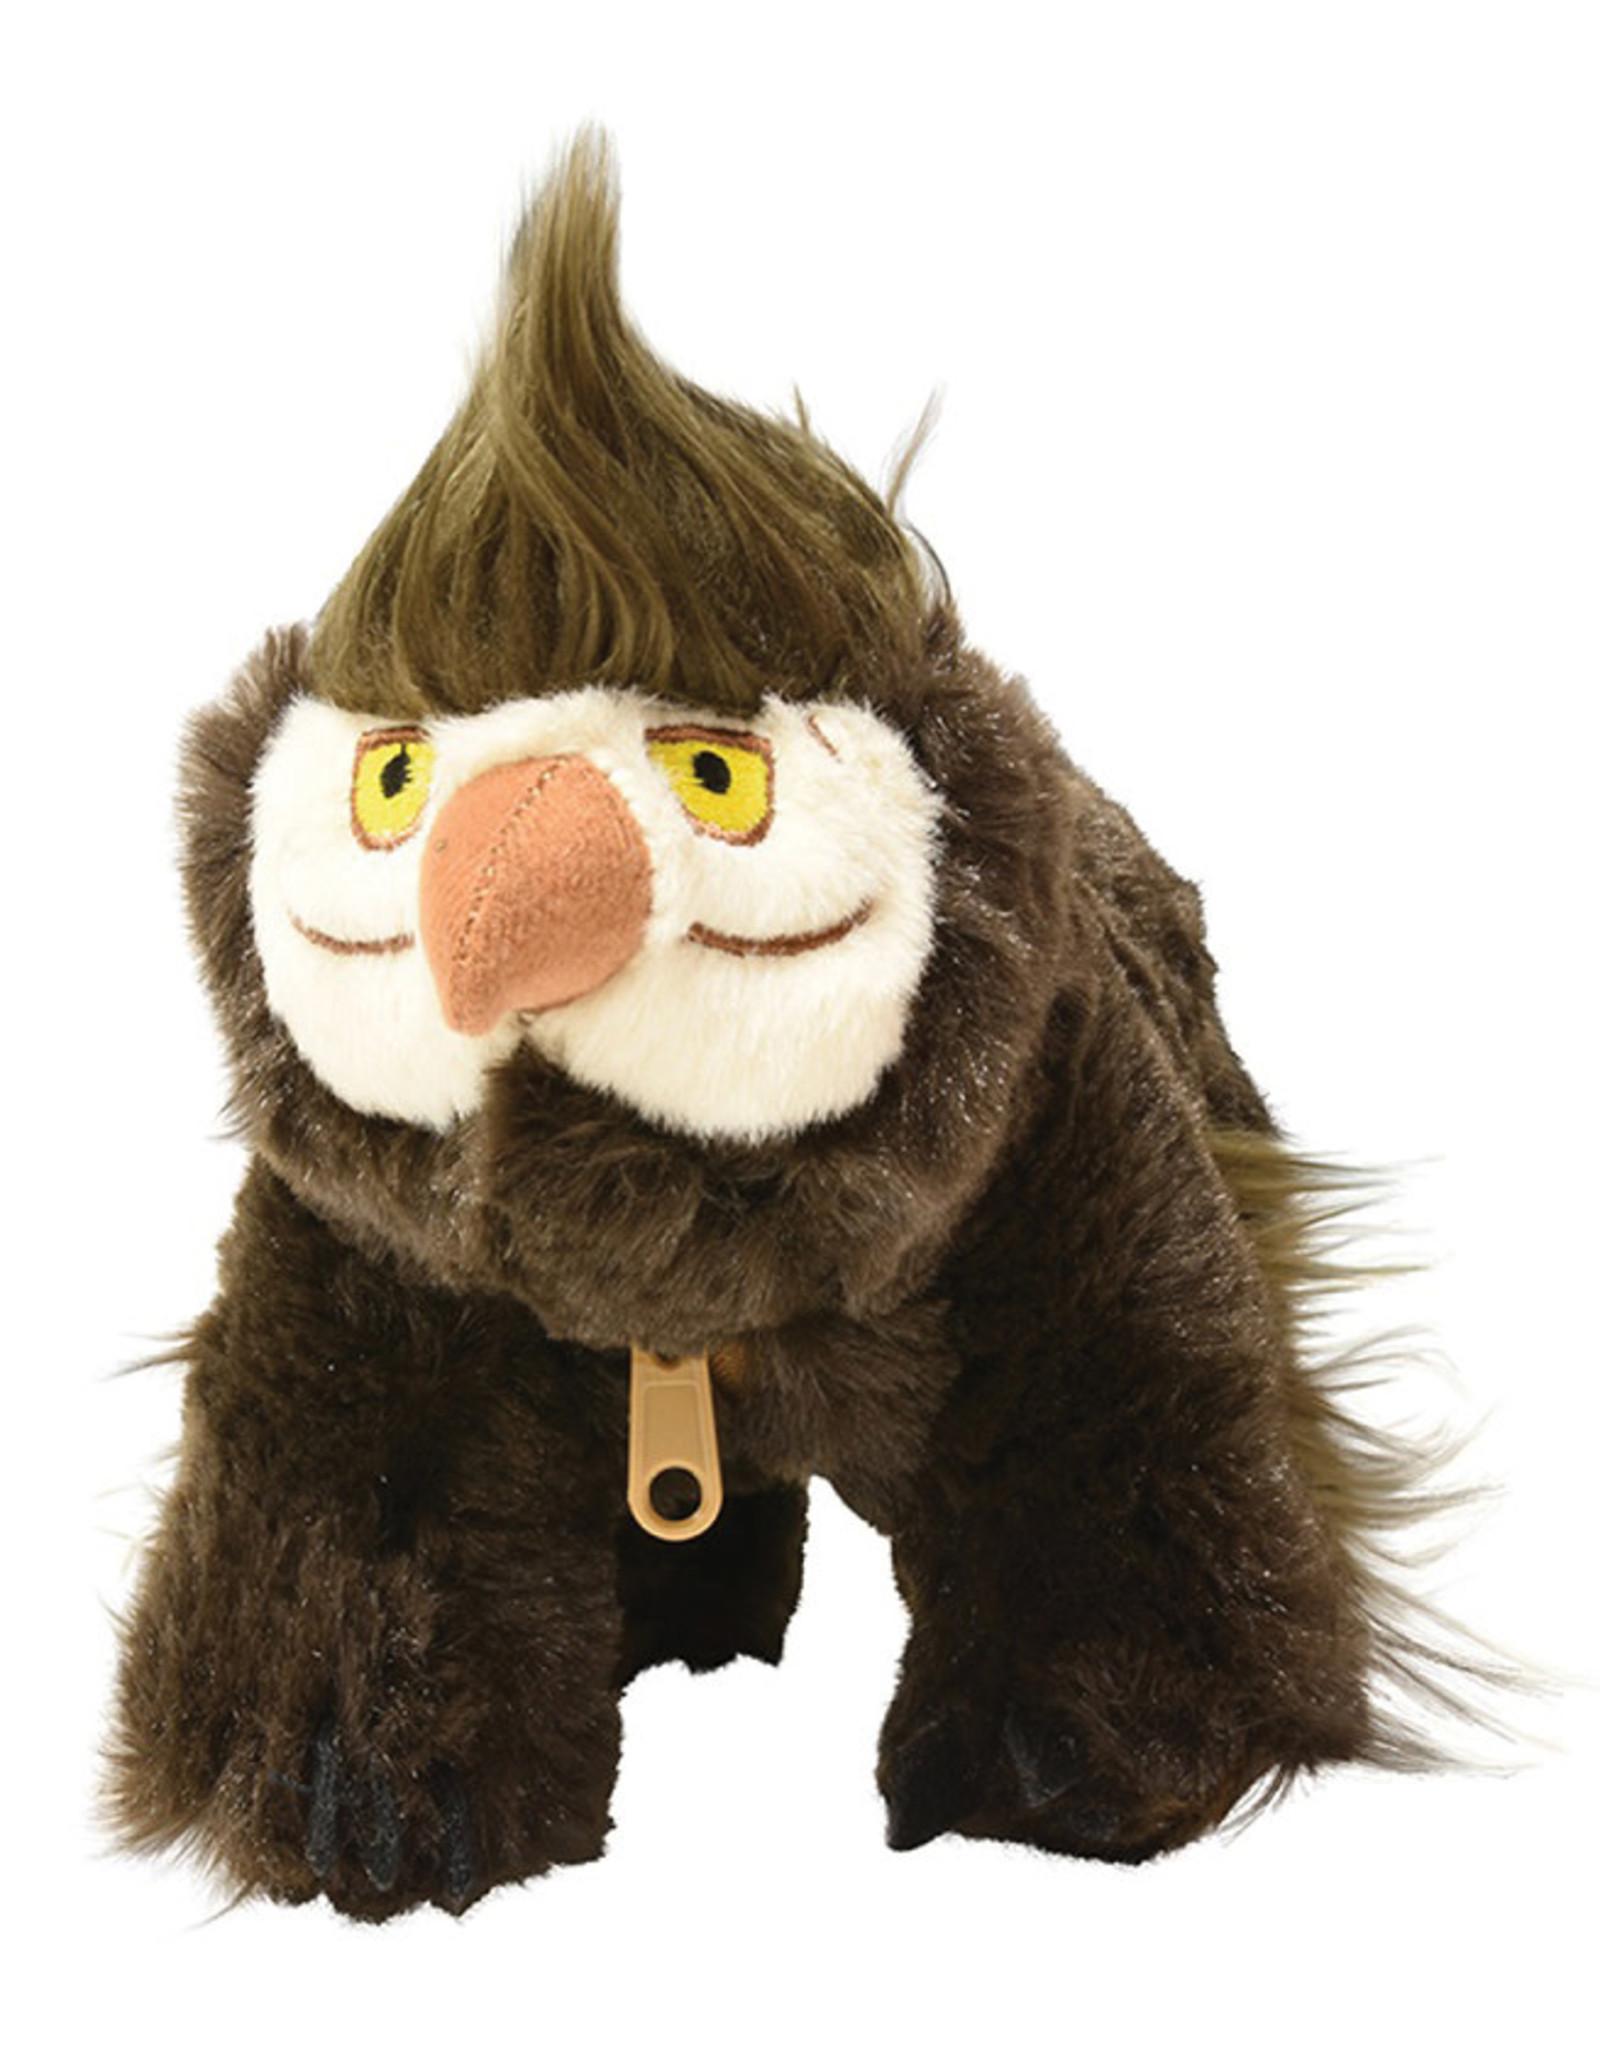 Ultra Pro Dungeons & Dragons: Owlbear Gamer Pouch